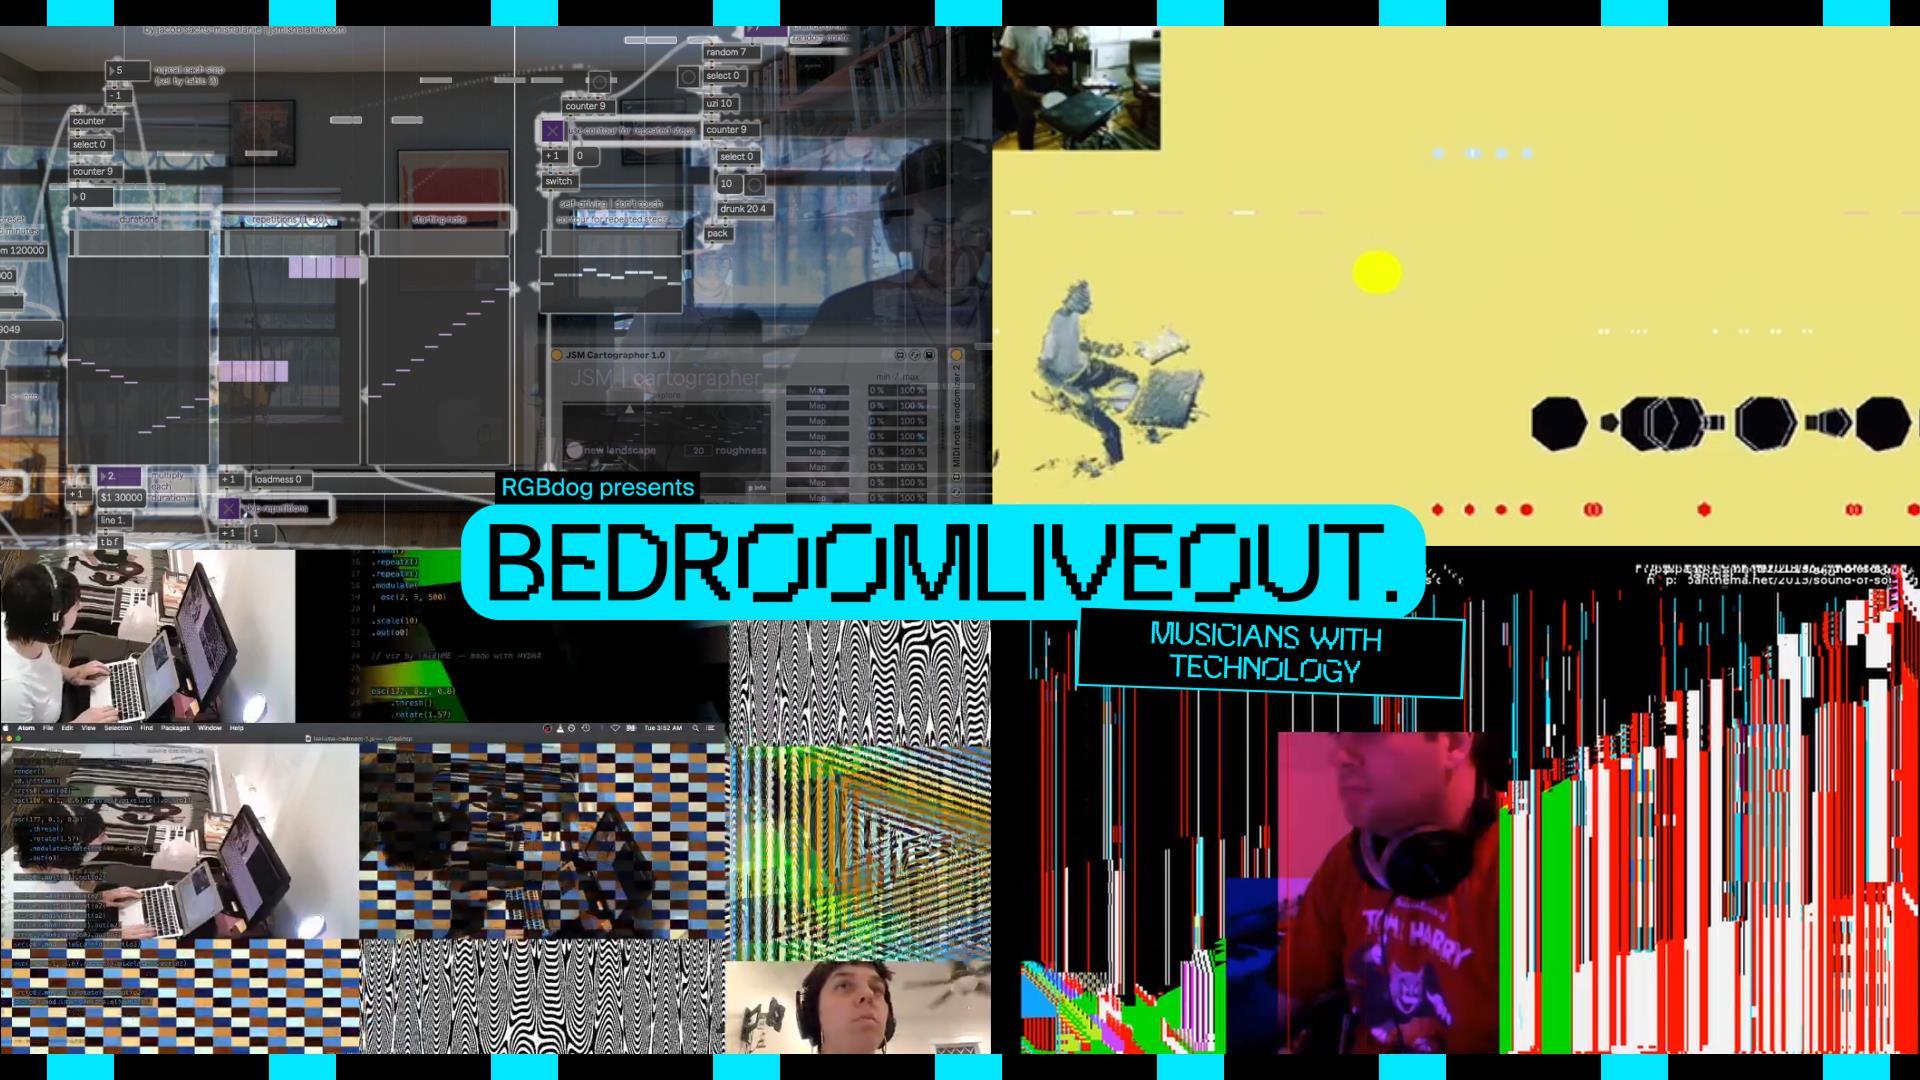 bedroomliveout_4.jpg